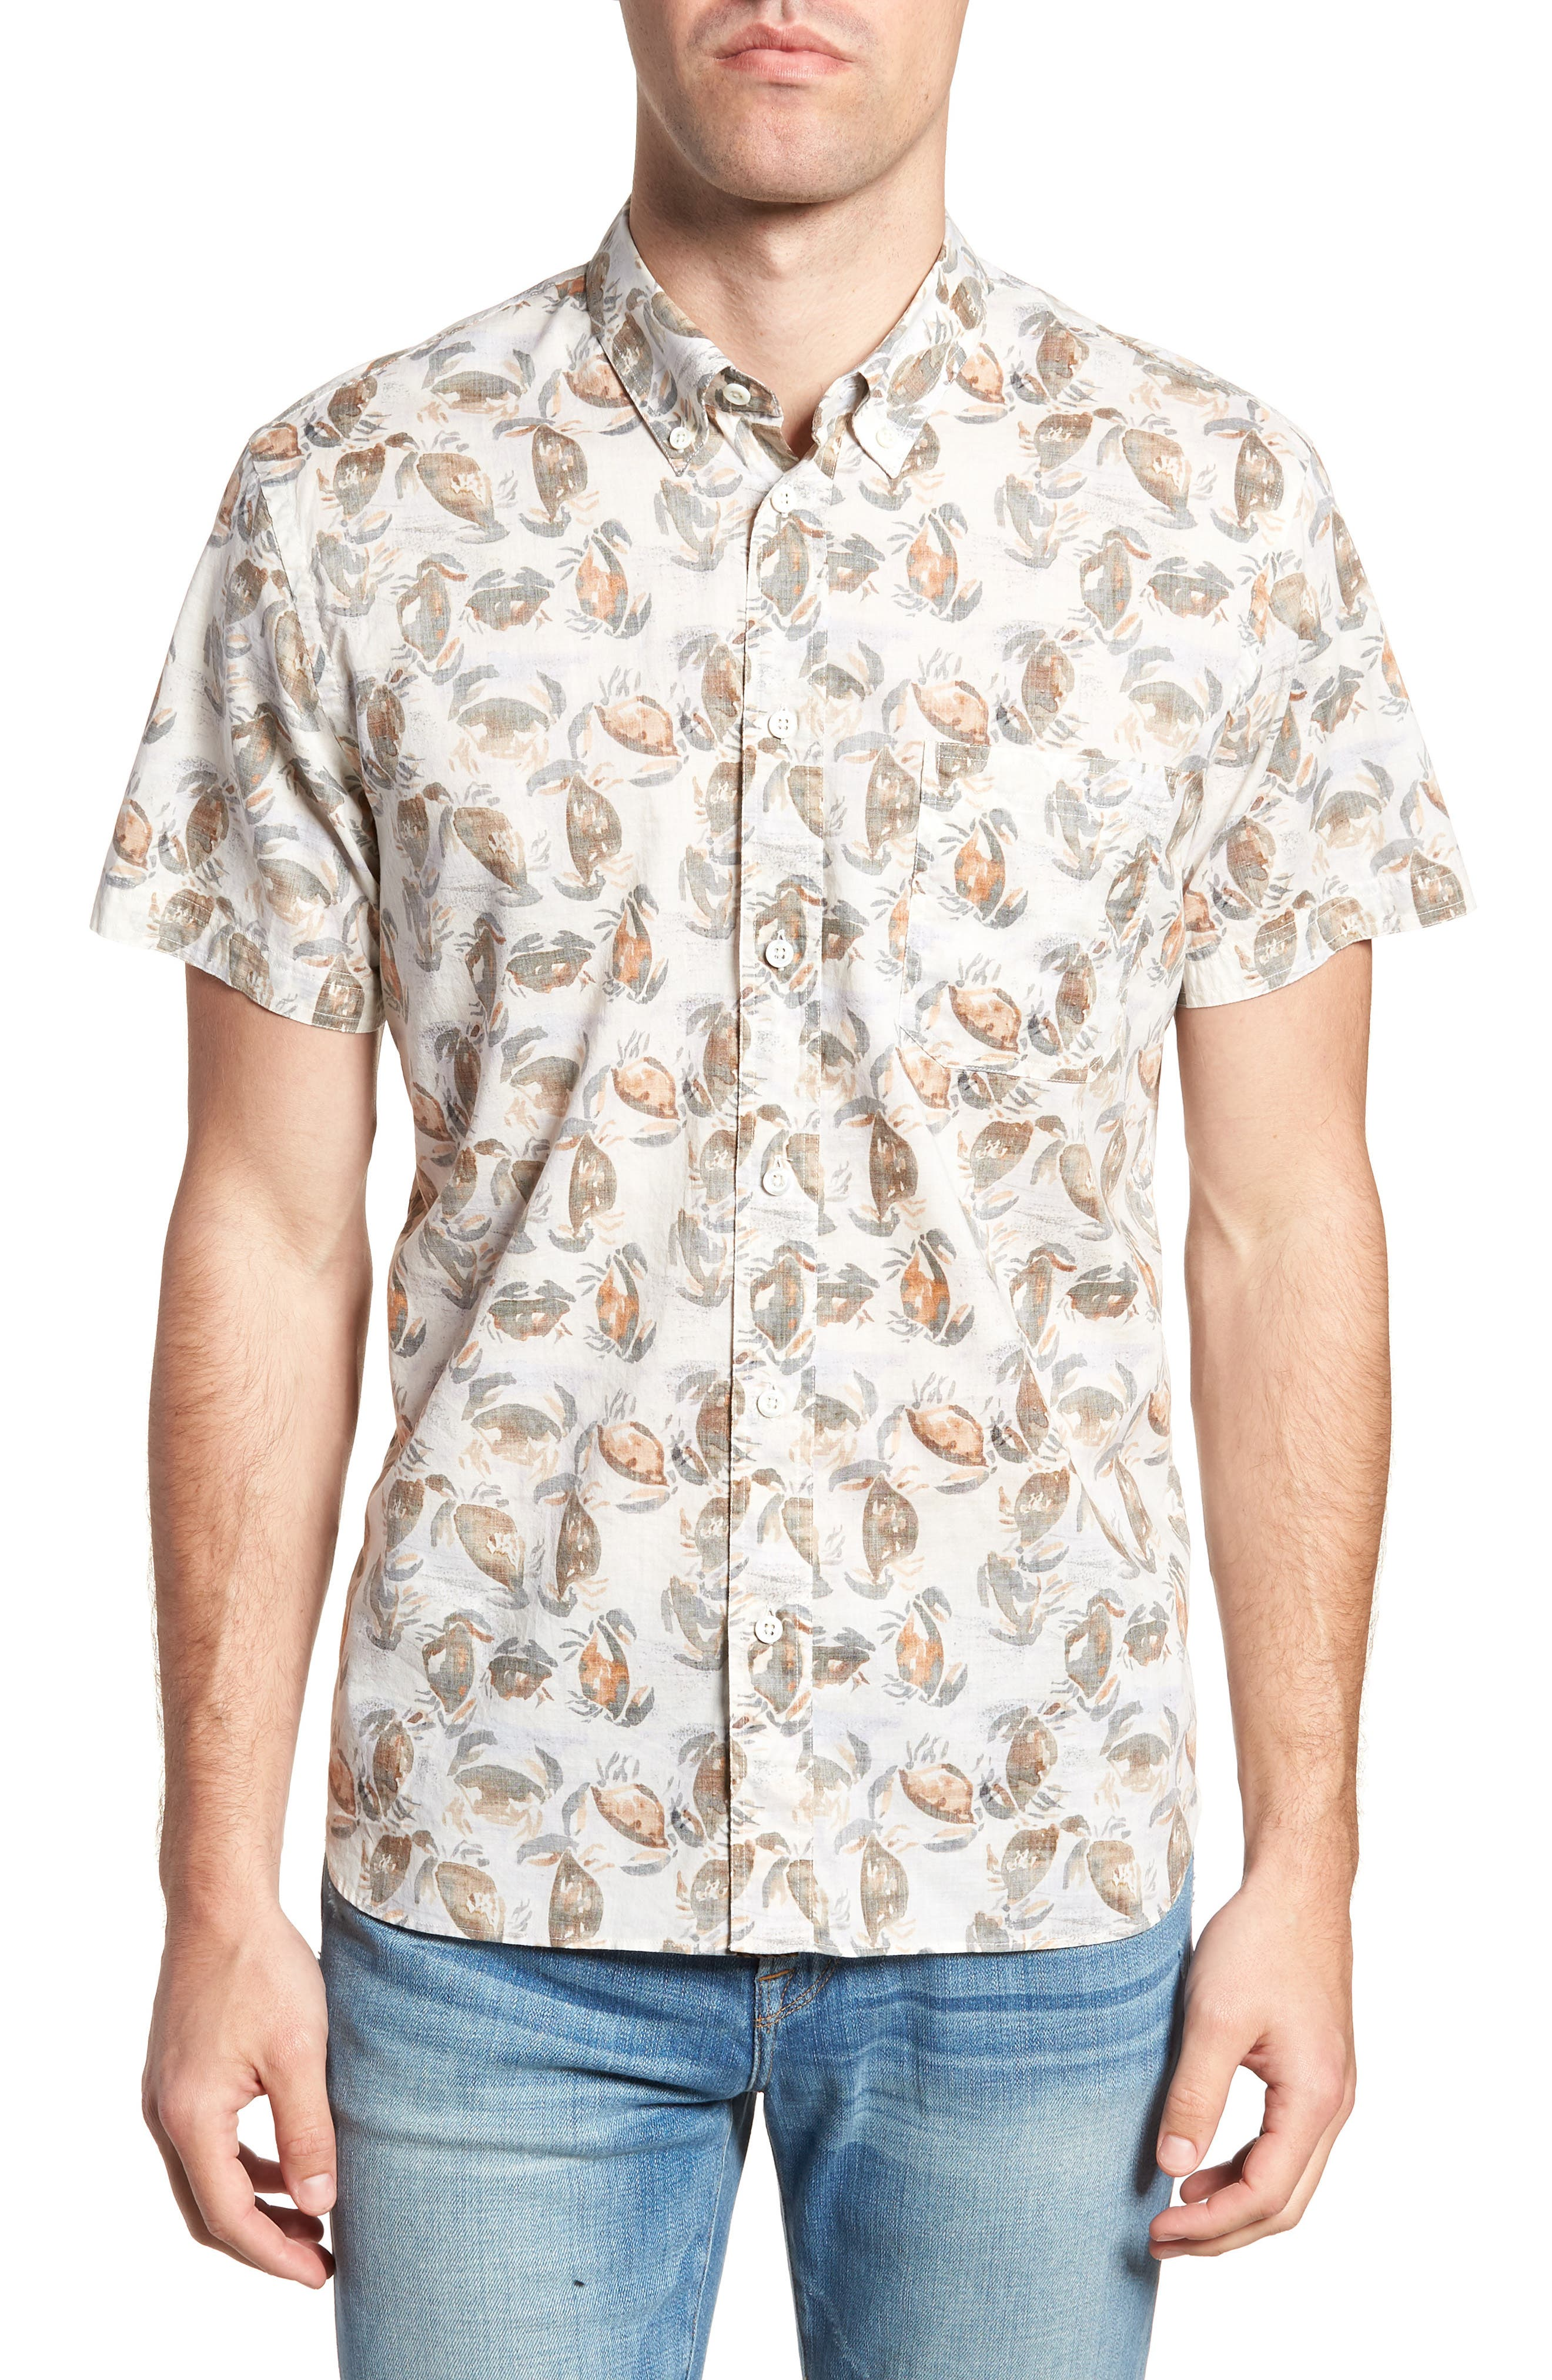 Tuscumbia Standard Fit Short Sleeve Sport Shirt,                             Main thumbnail 1, color,                             CREAM CRAB